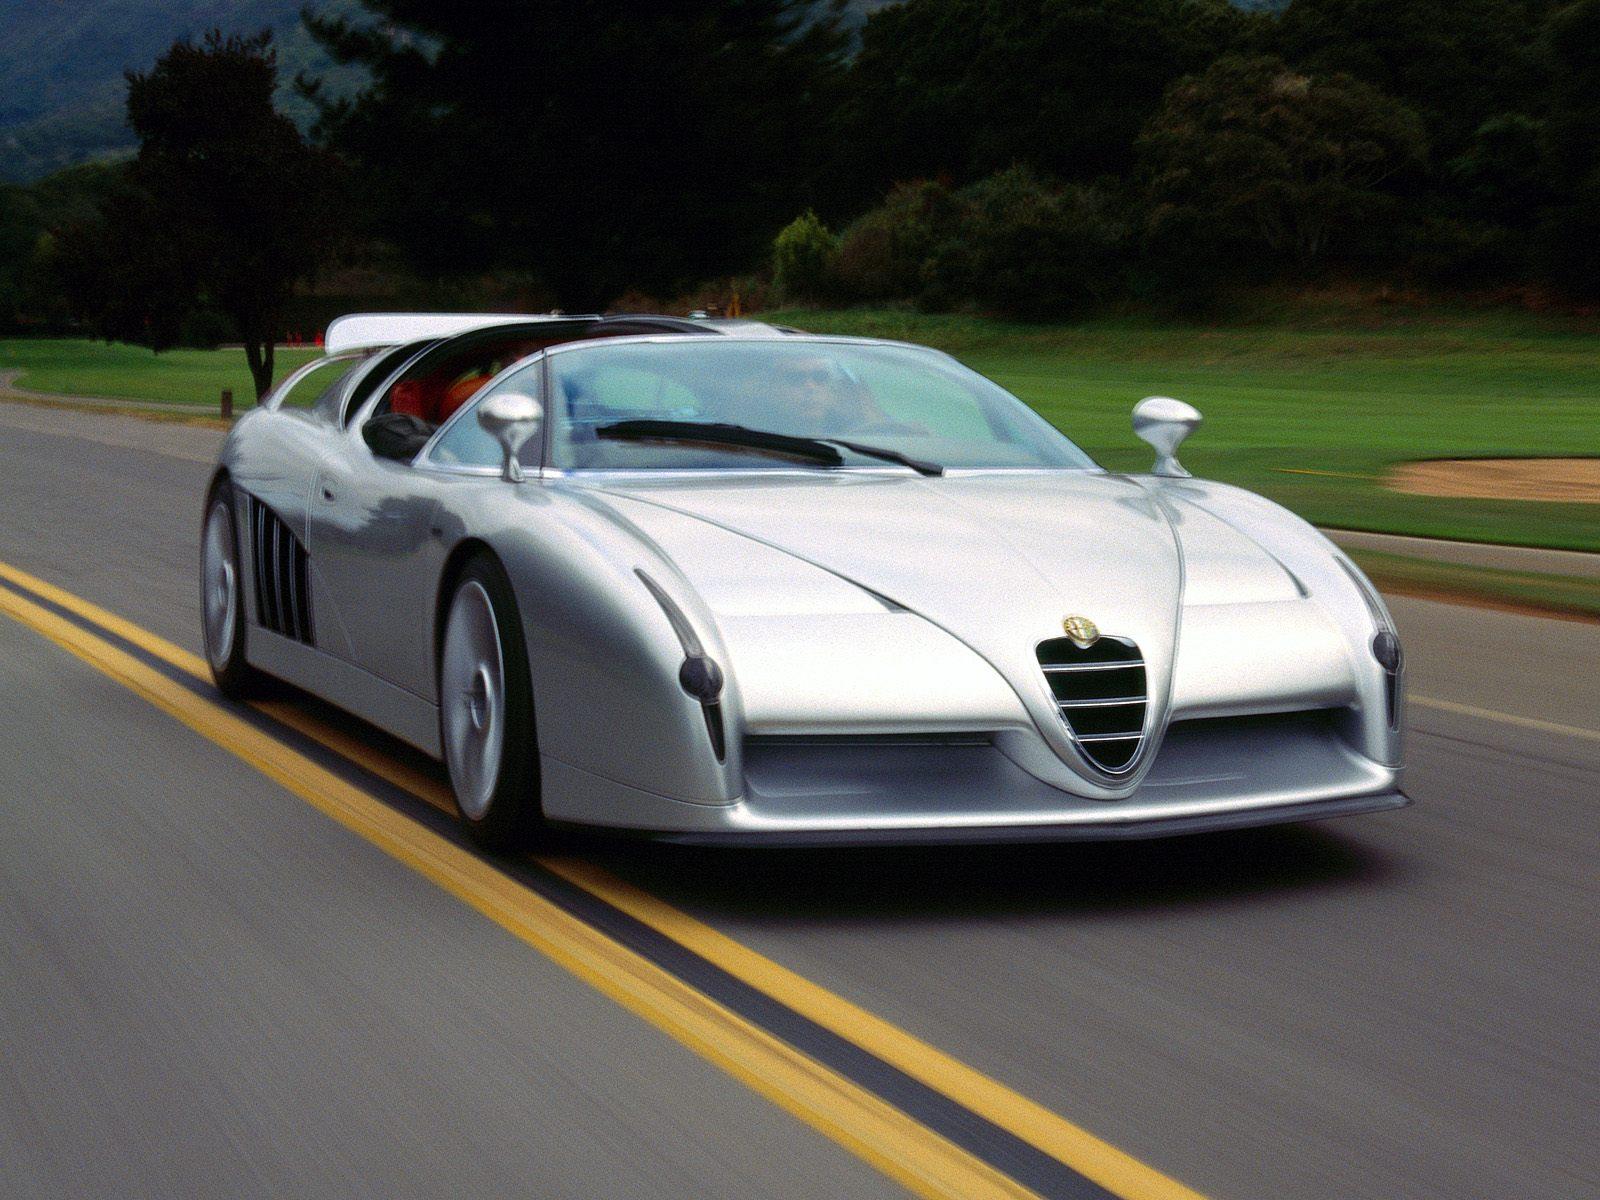 Bestand Alfa Romeo GT 1300 Junior 1975 moreover 12678 najciekawsze Prototypy Z Lat 1991 2000 Nieobjete Produkcja 3 additionally Italdesign 2 also 5 Best Looking Bmws besides Watch. on italdesign scighera